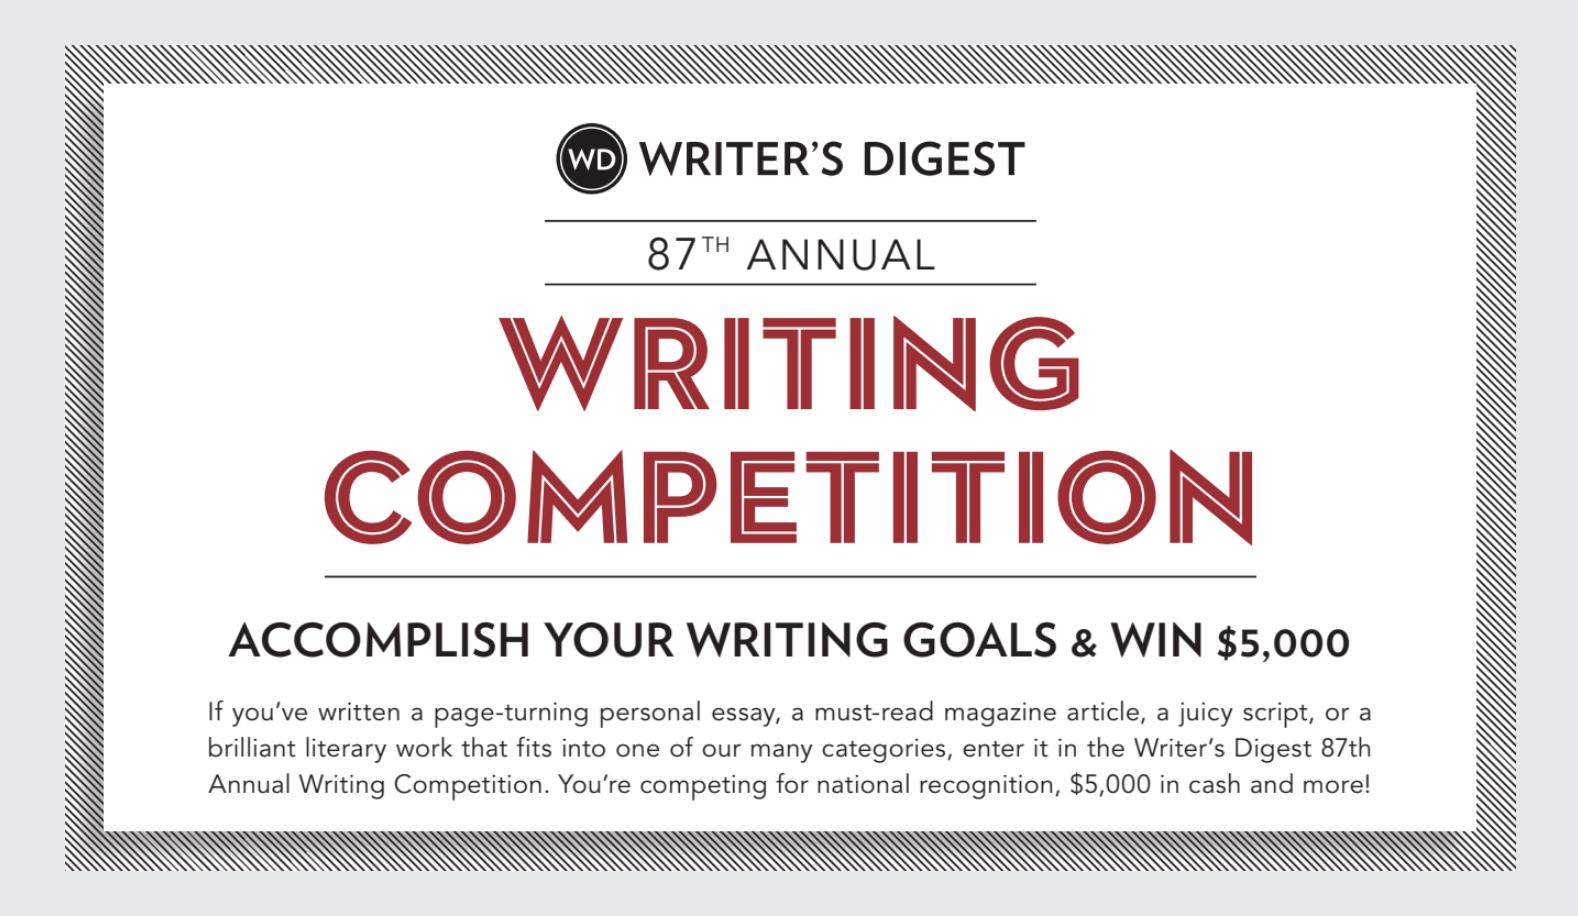 Help writing comps